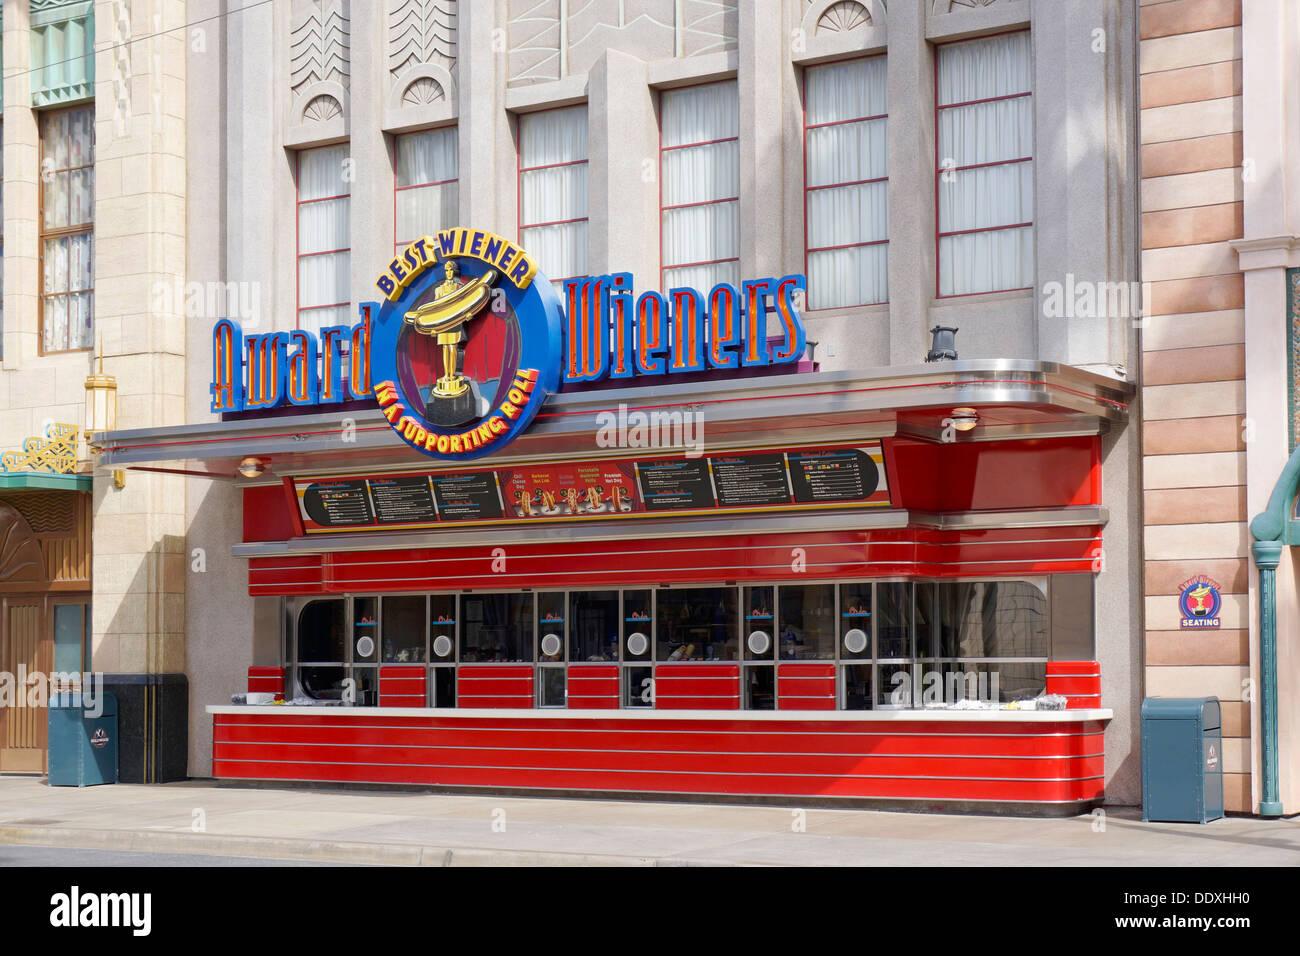 Award Wieners, Disneyland, California Adventure Park, Anaheim - Stock Image